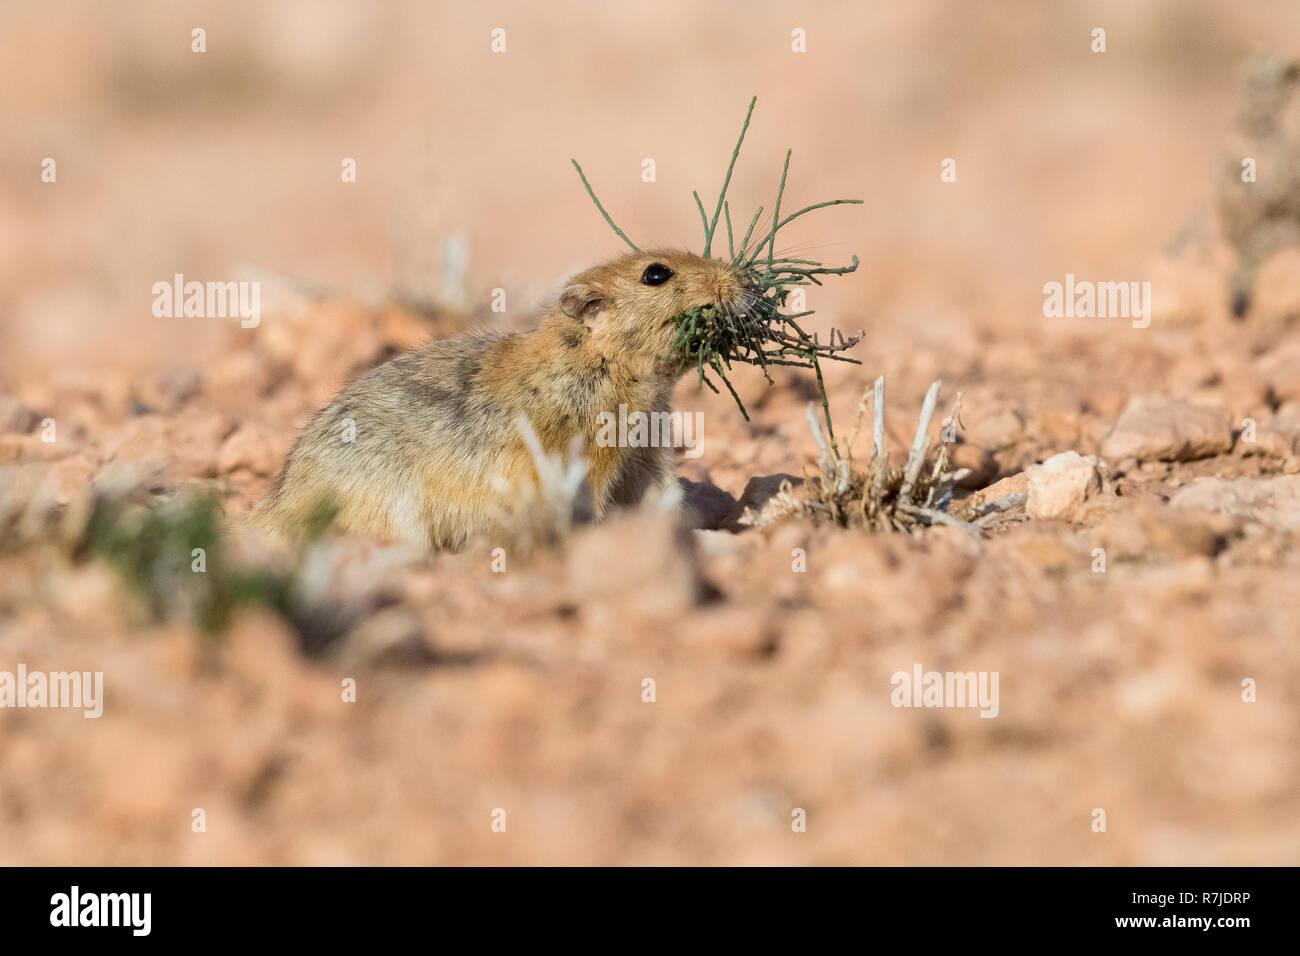 Fat Sand Ratte (Psammomys obesus), Erwachsene mit Gras im Maul Stockbild